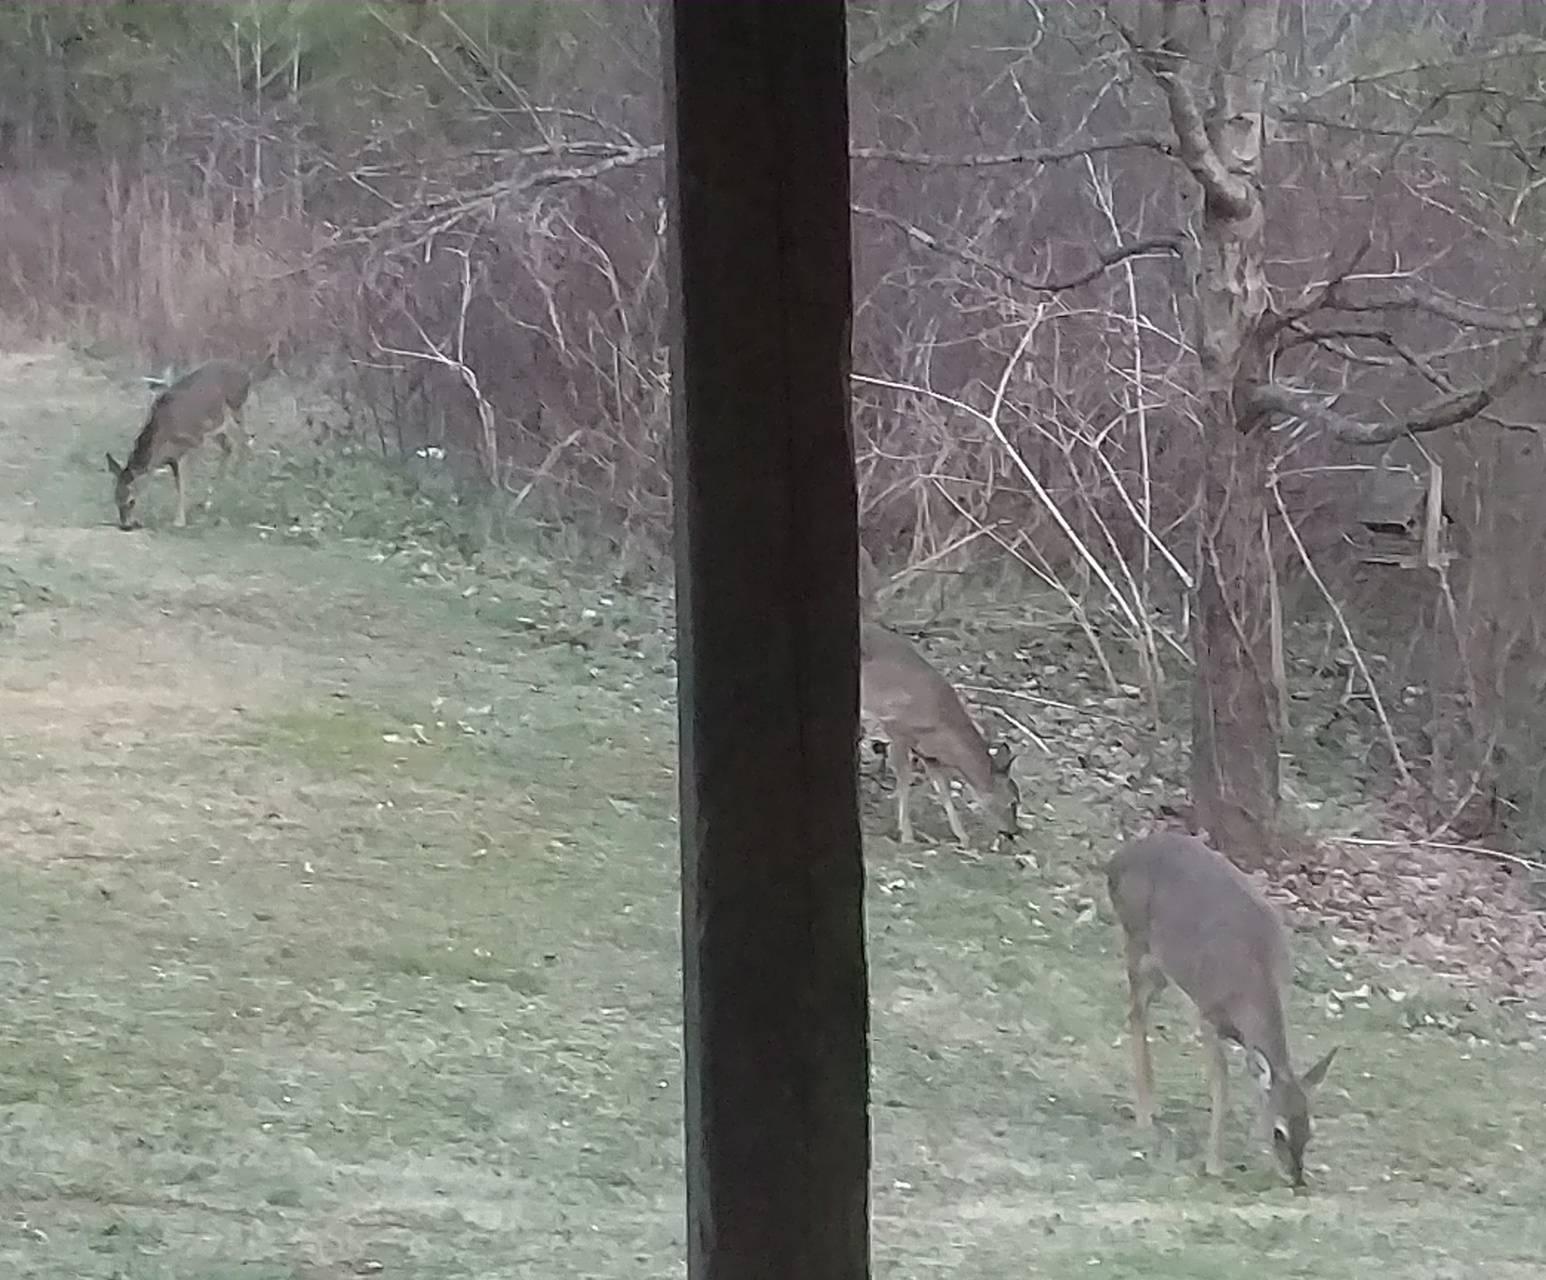 Deer in my backyard